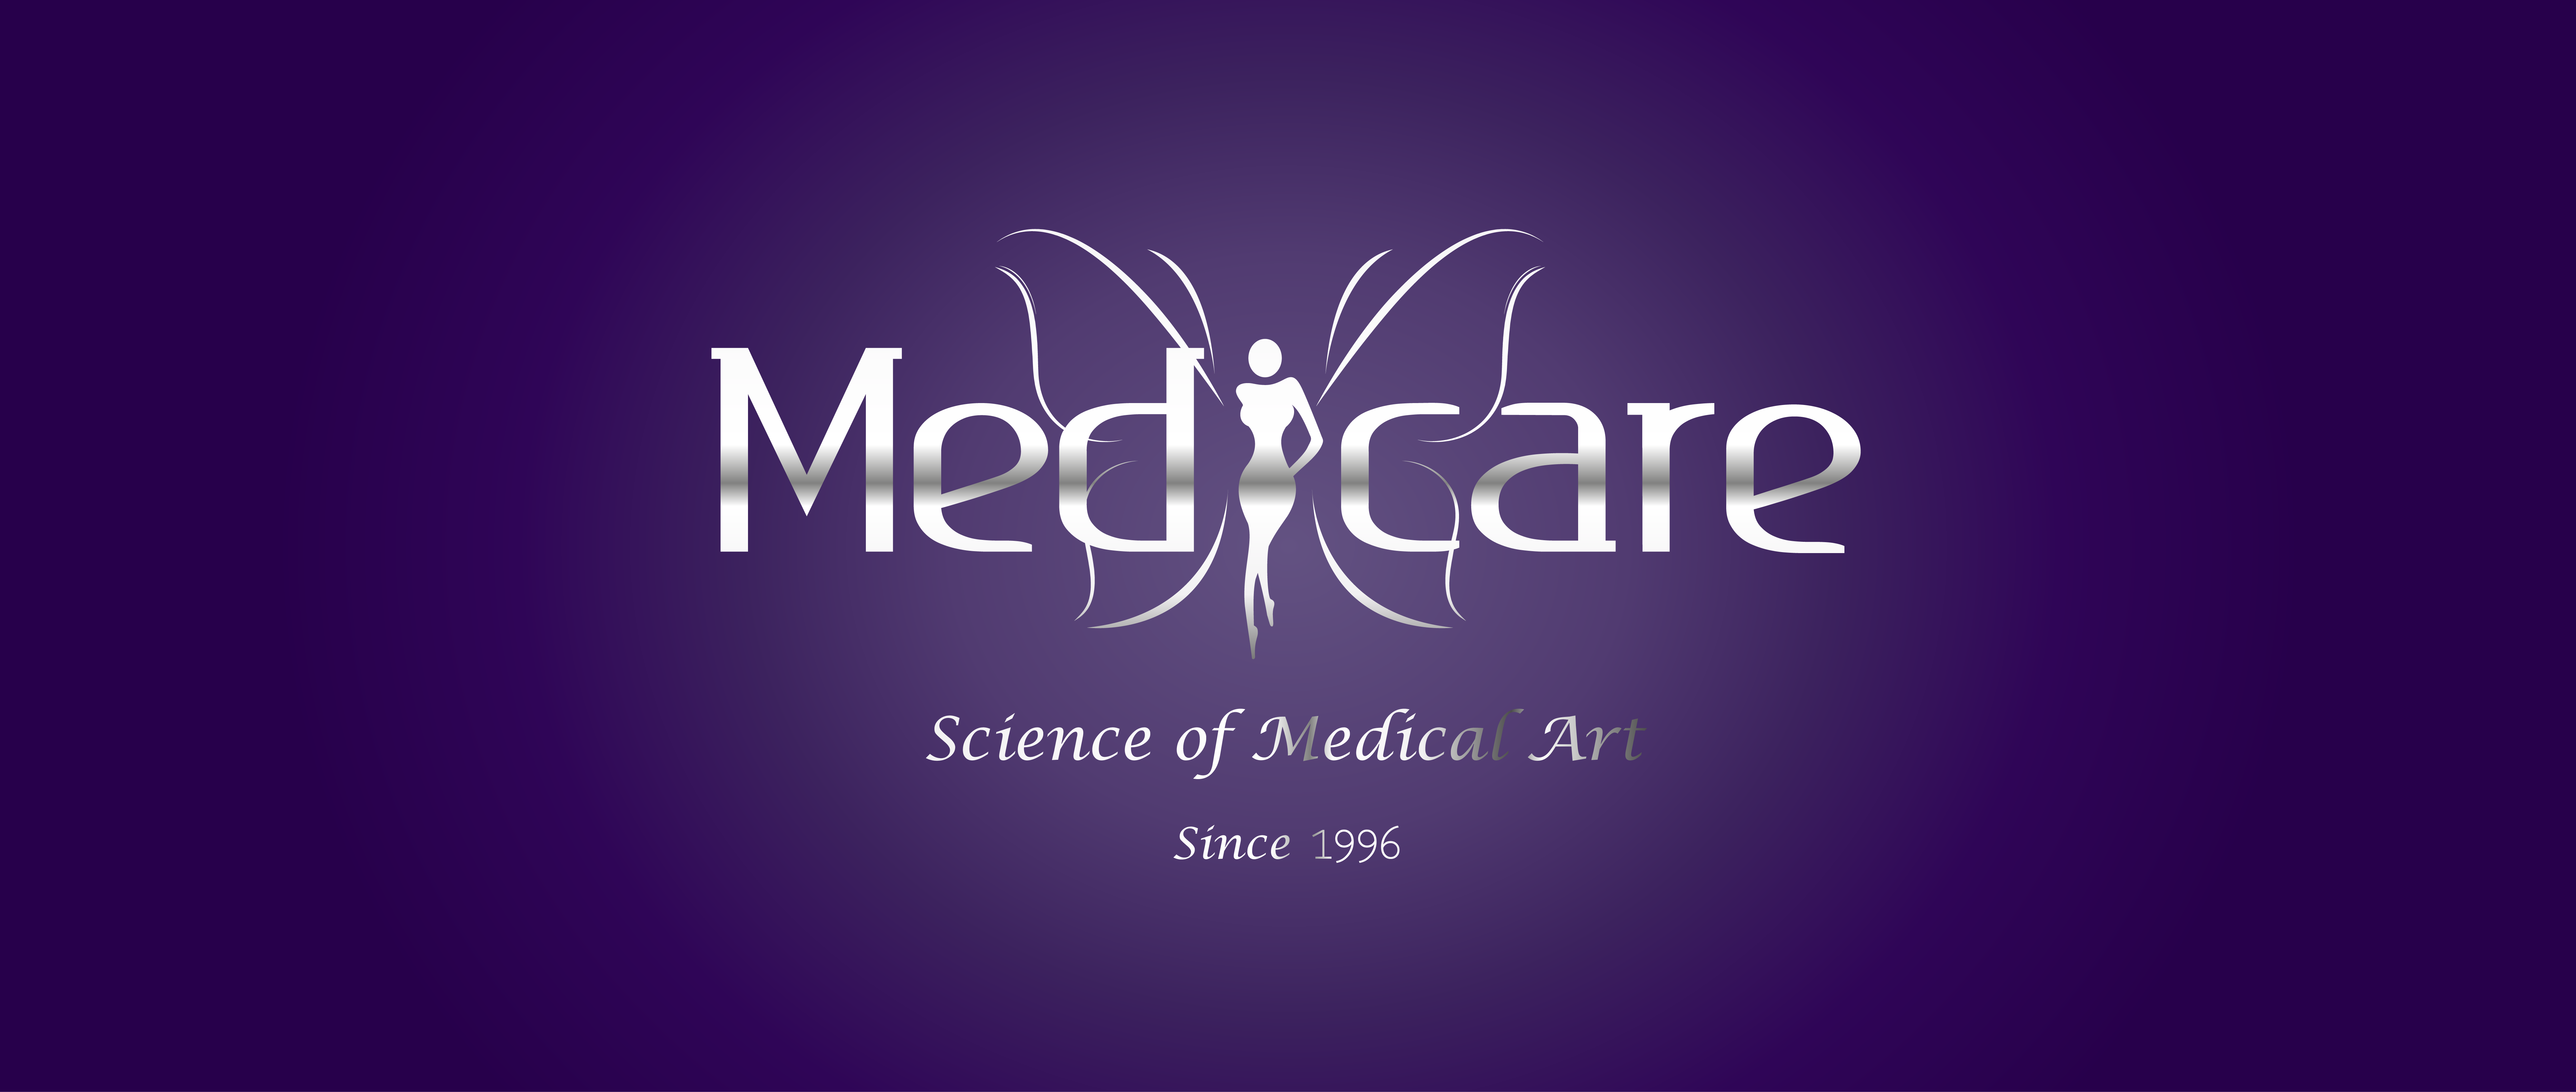 Medicare – Science Of Medical Art | บริการทางการแพทย์ของ เมดิแคร์